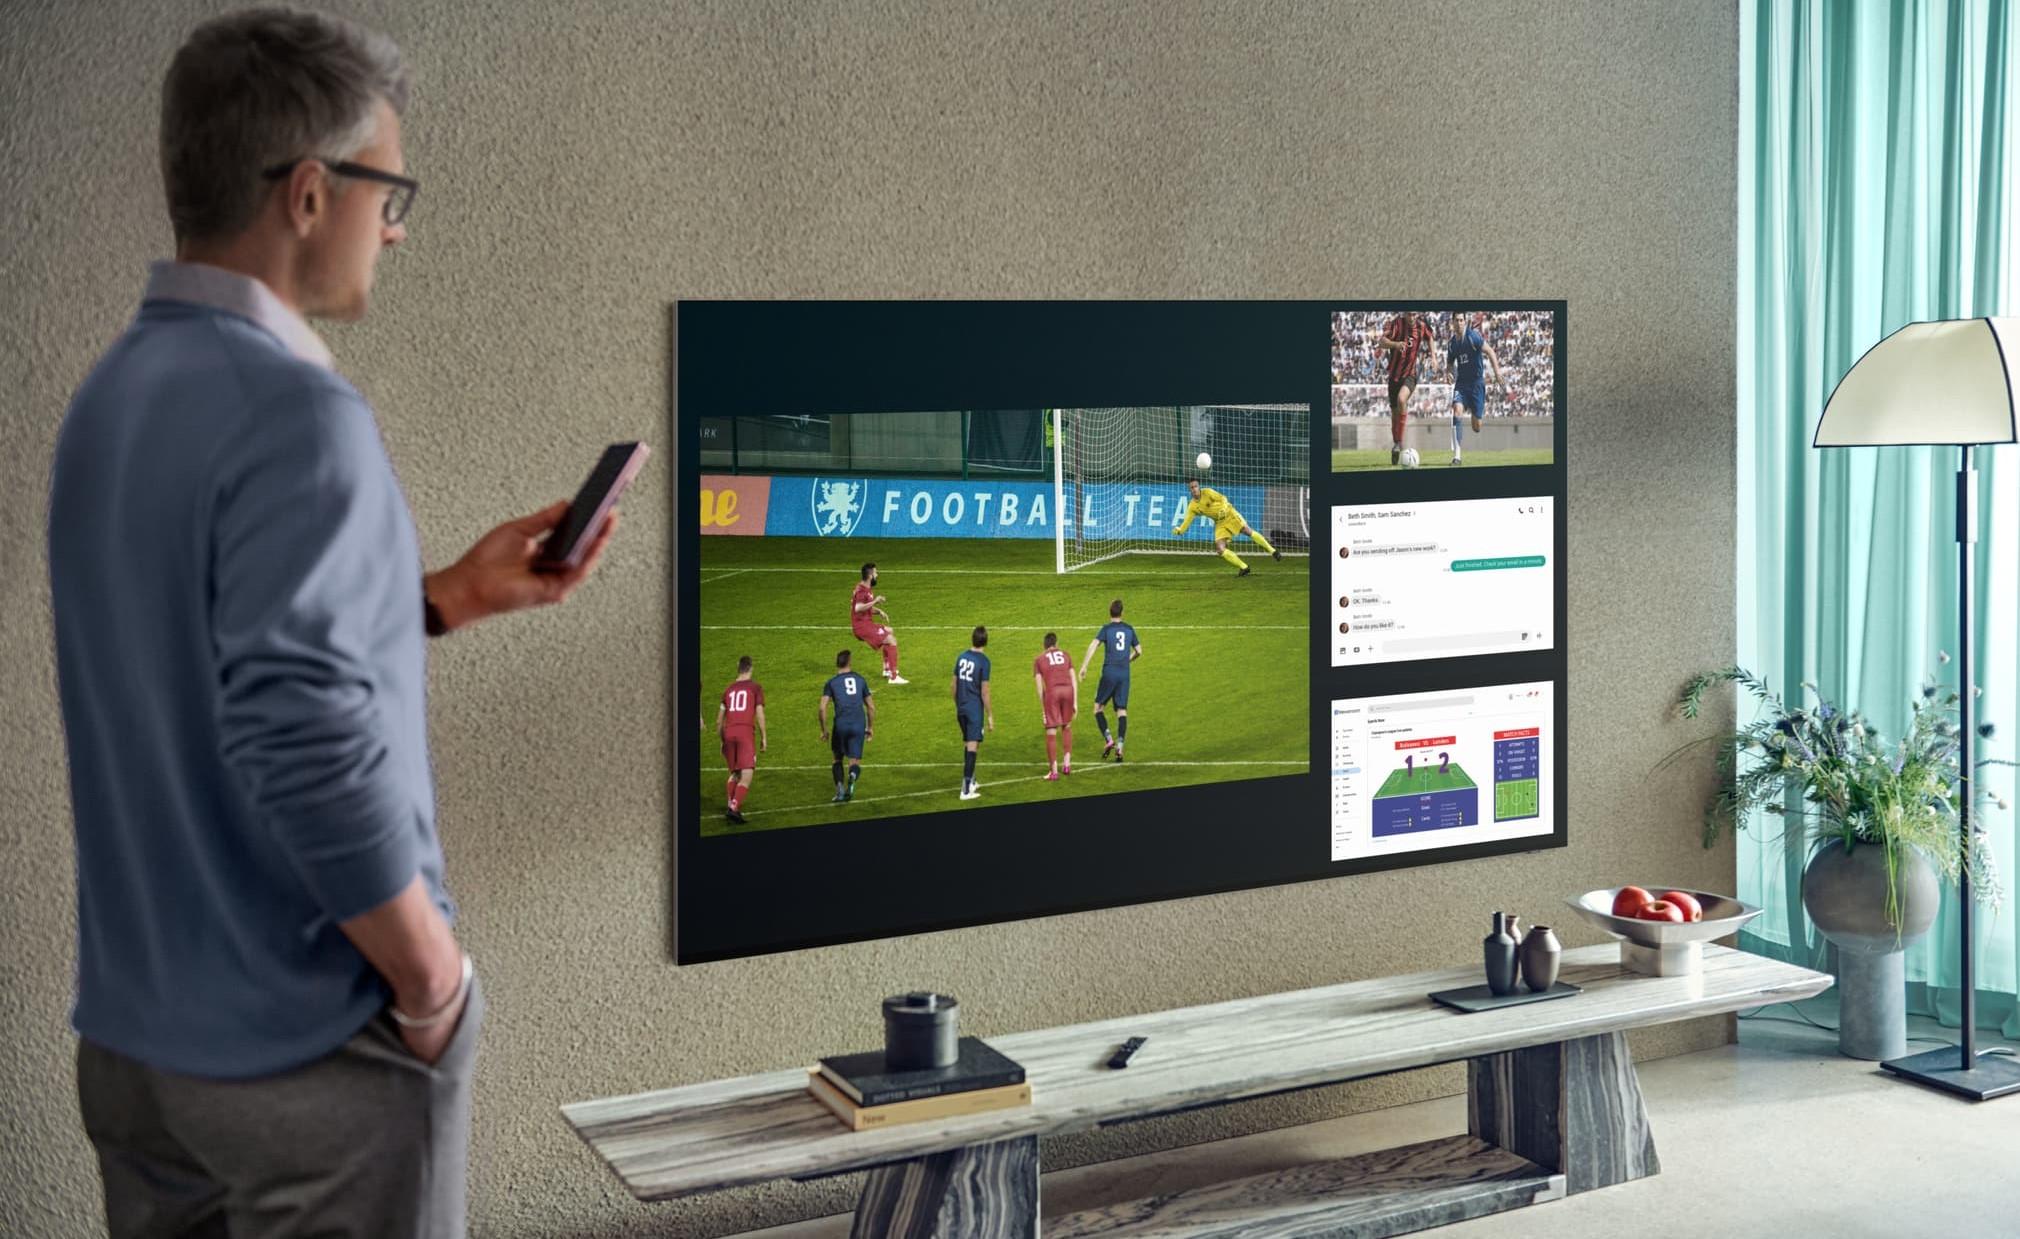 Samsung's 8K Neo QLED TV lineup starts at $3,500 - Engadget